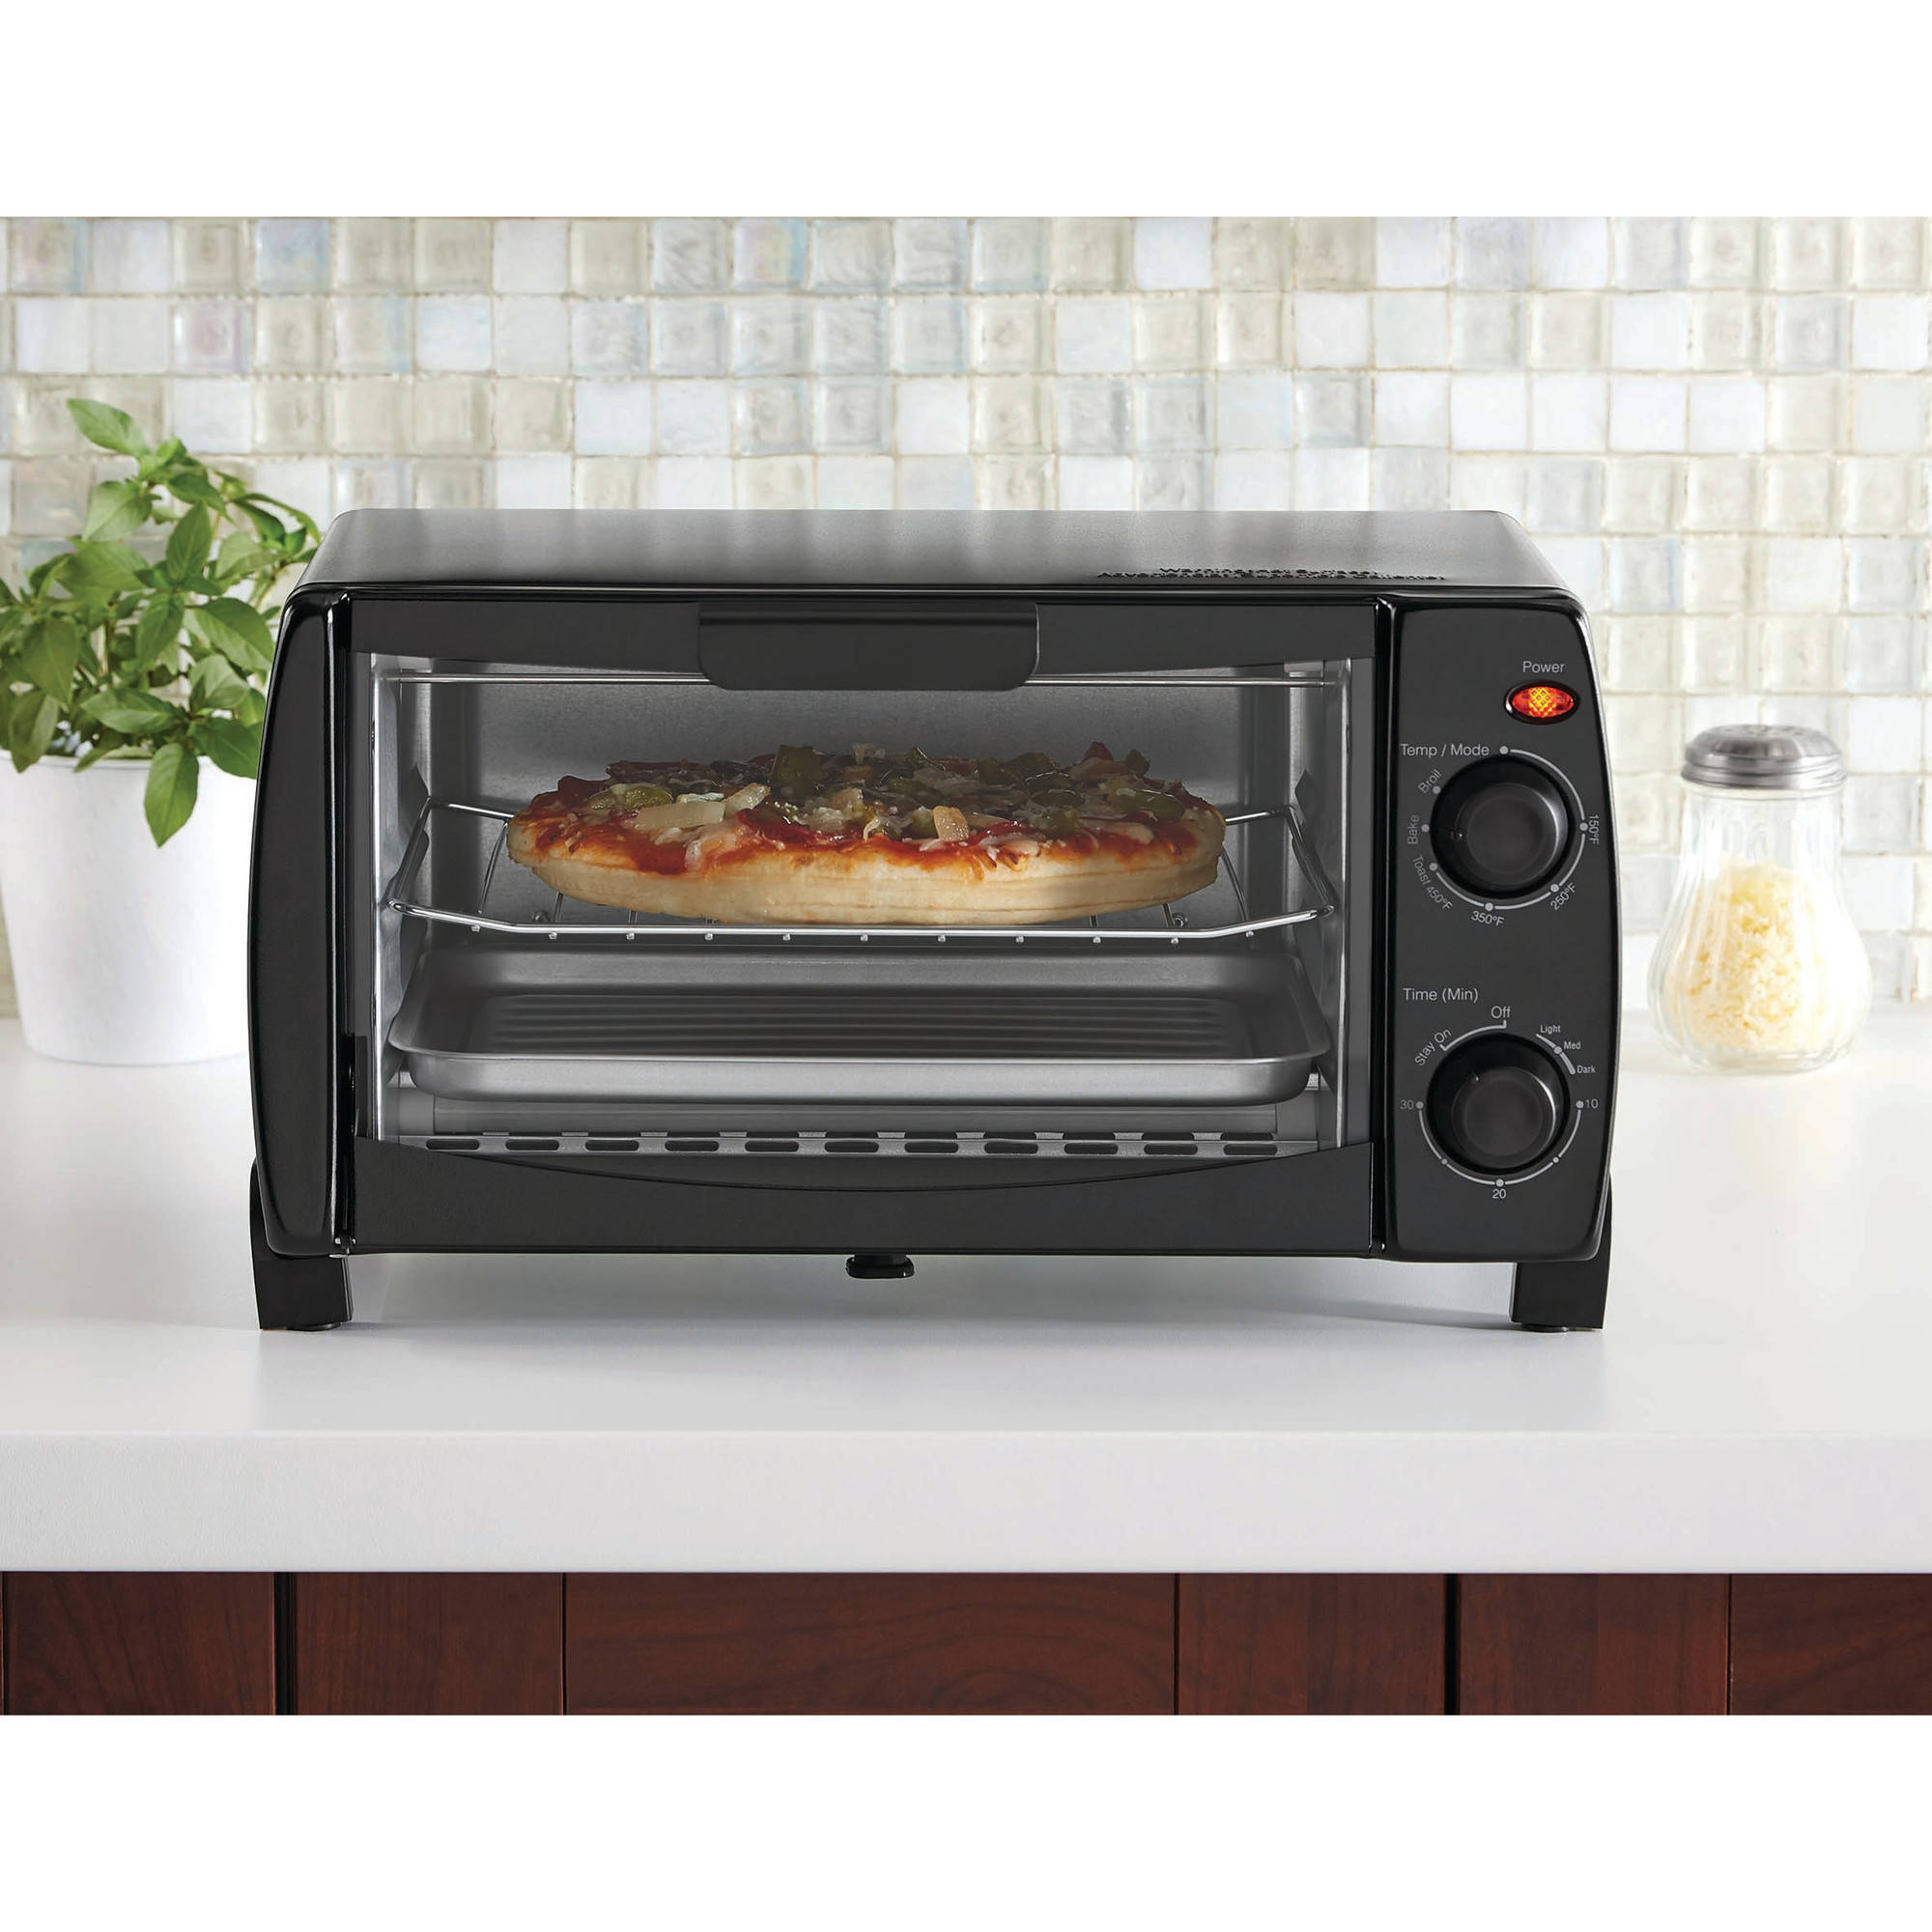 Mainstays 4-Slice Toaster Oven, Black